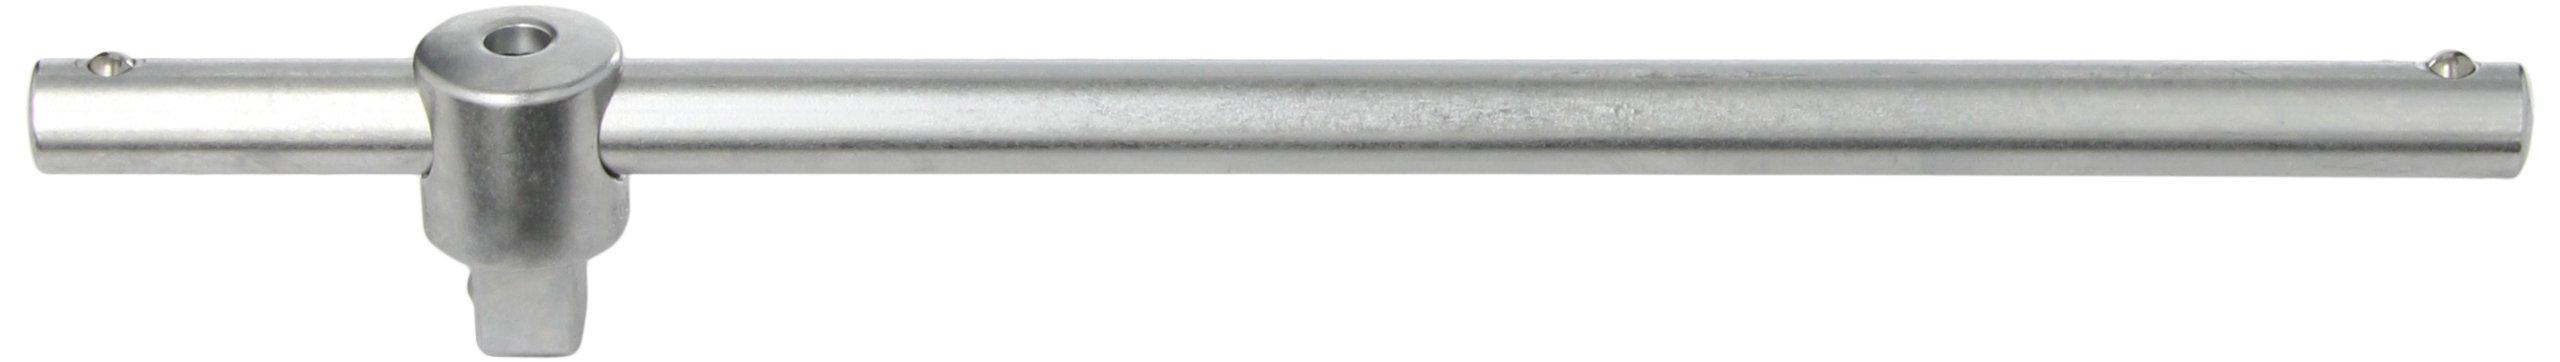 Stahlwille 506 Sliding T-Handle, 1/2'' Drive, 300mm Length